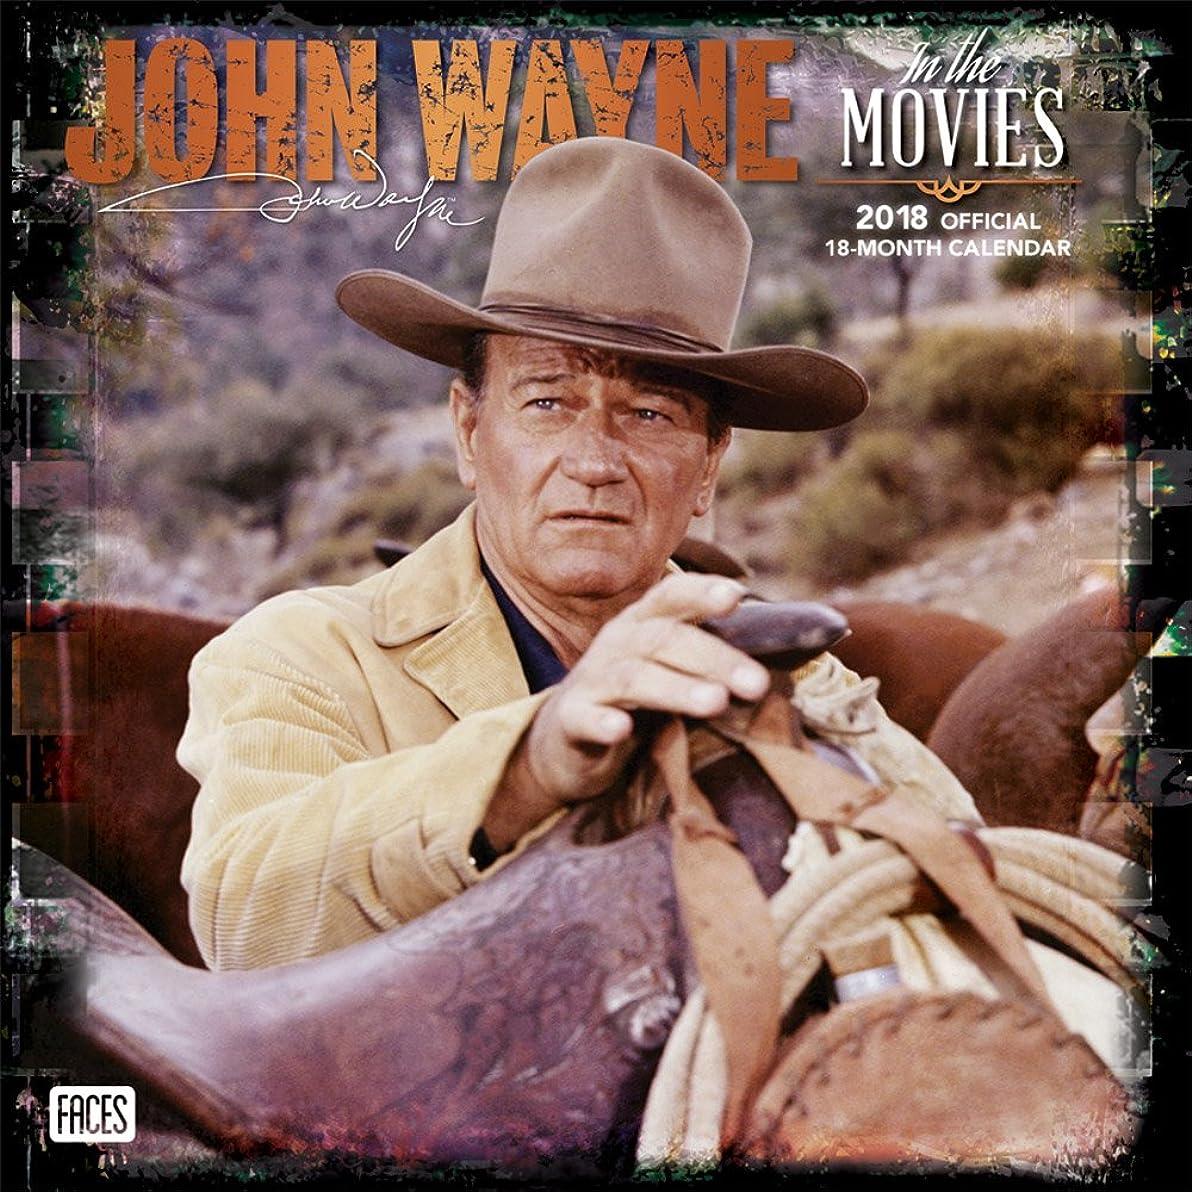 突破口克服する苦情文句John Wayne in the Movies 2018 Calendar